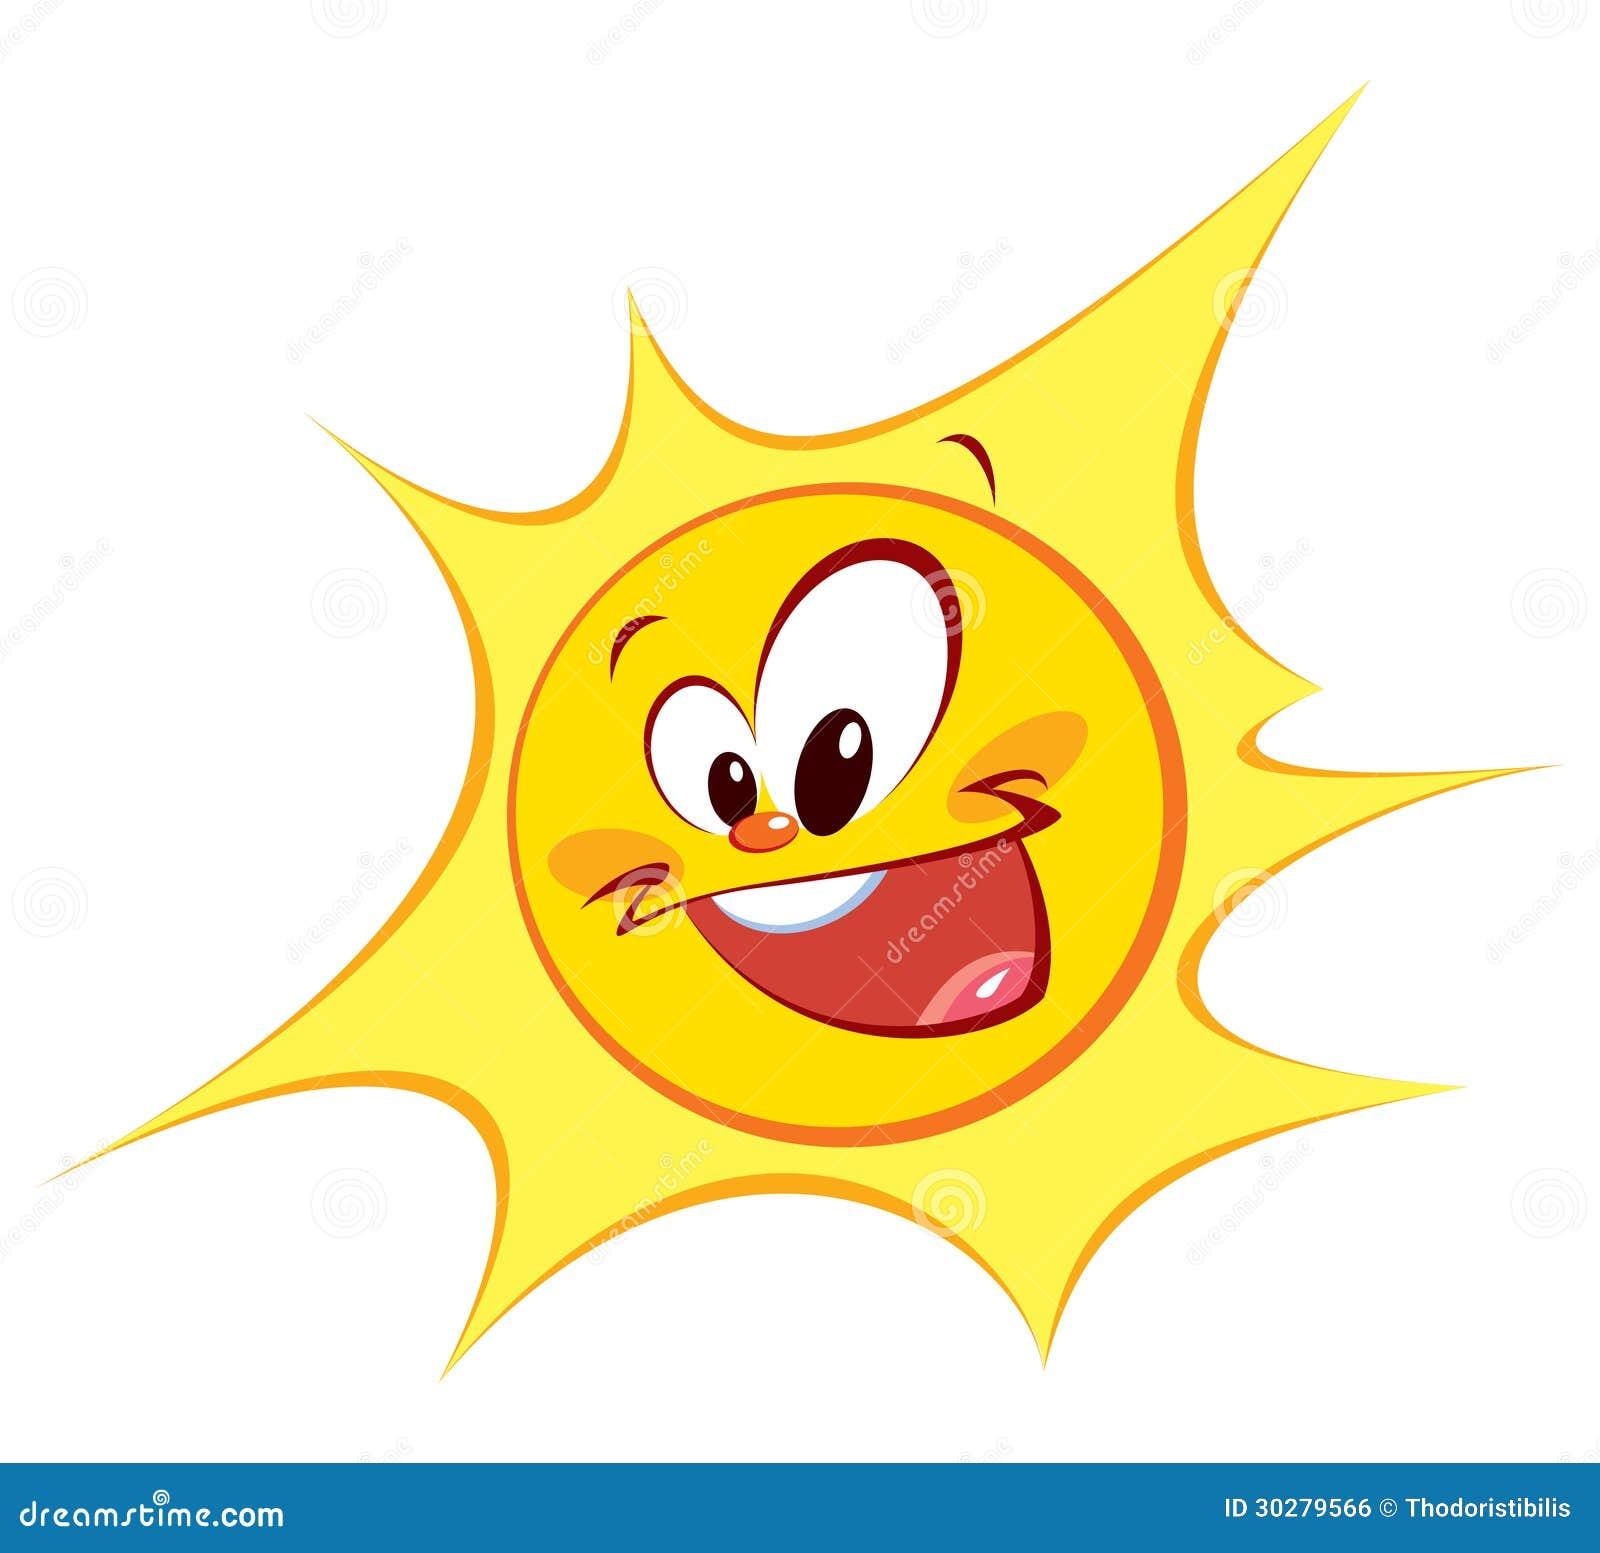 happy-shinny-sun-cute-face-30279566.jpg